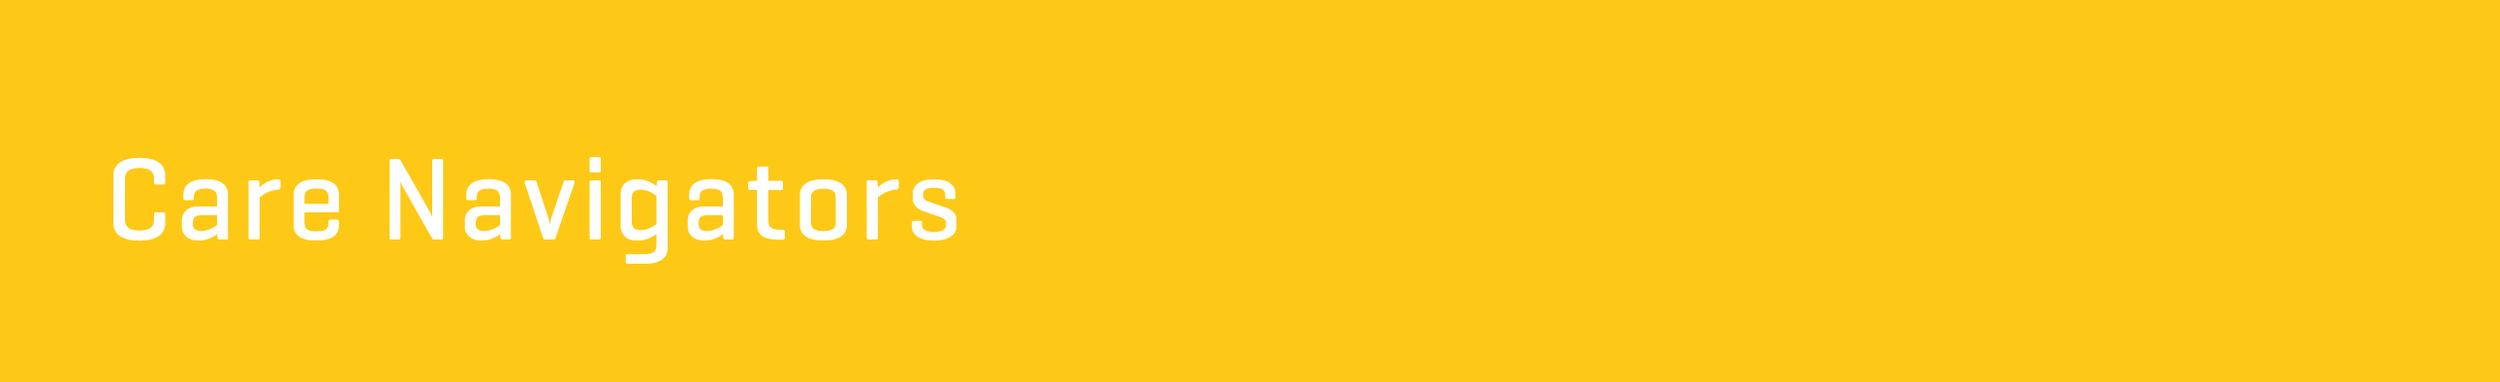 Care navigators banner yellow.png